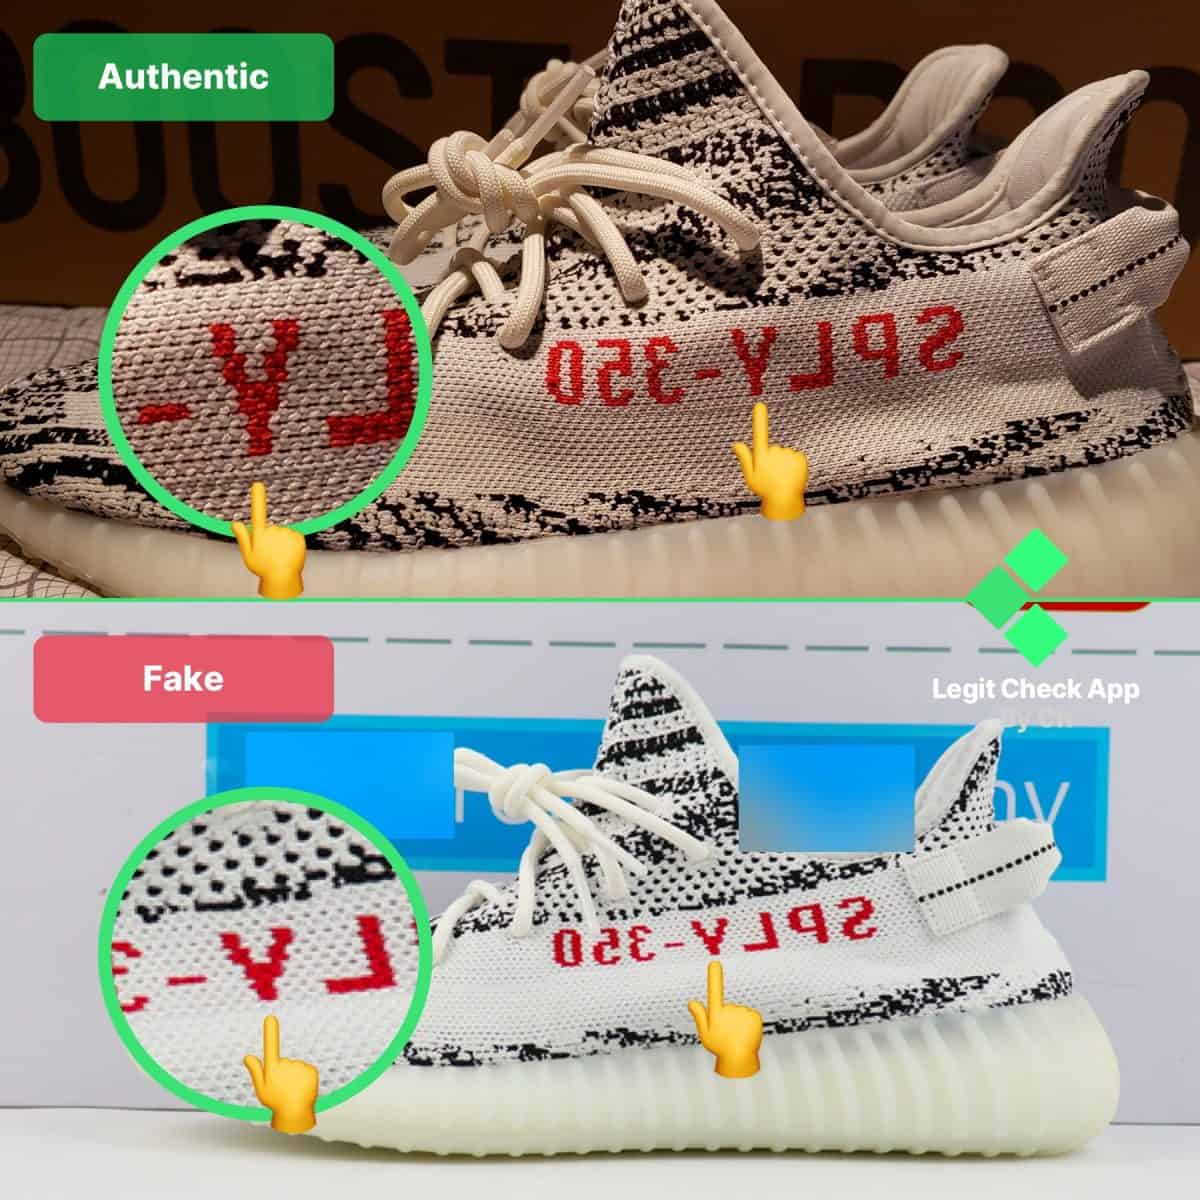 Yeezy Boost 350 V2 Zebra Fake Vs Real Legit Check Guide